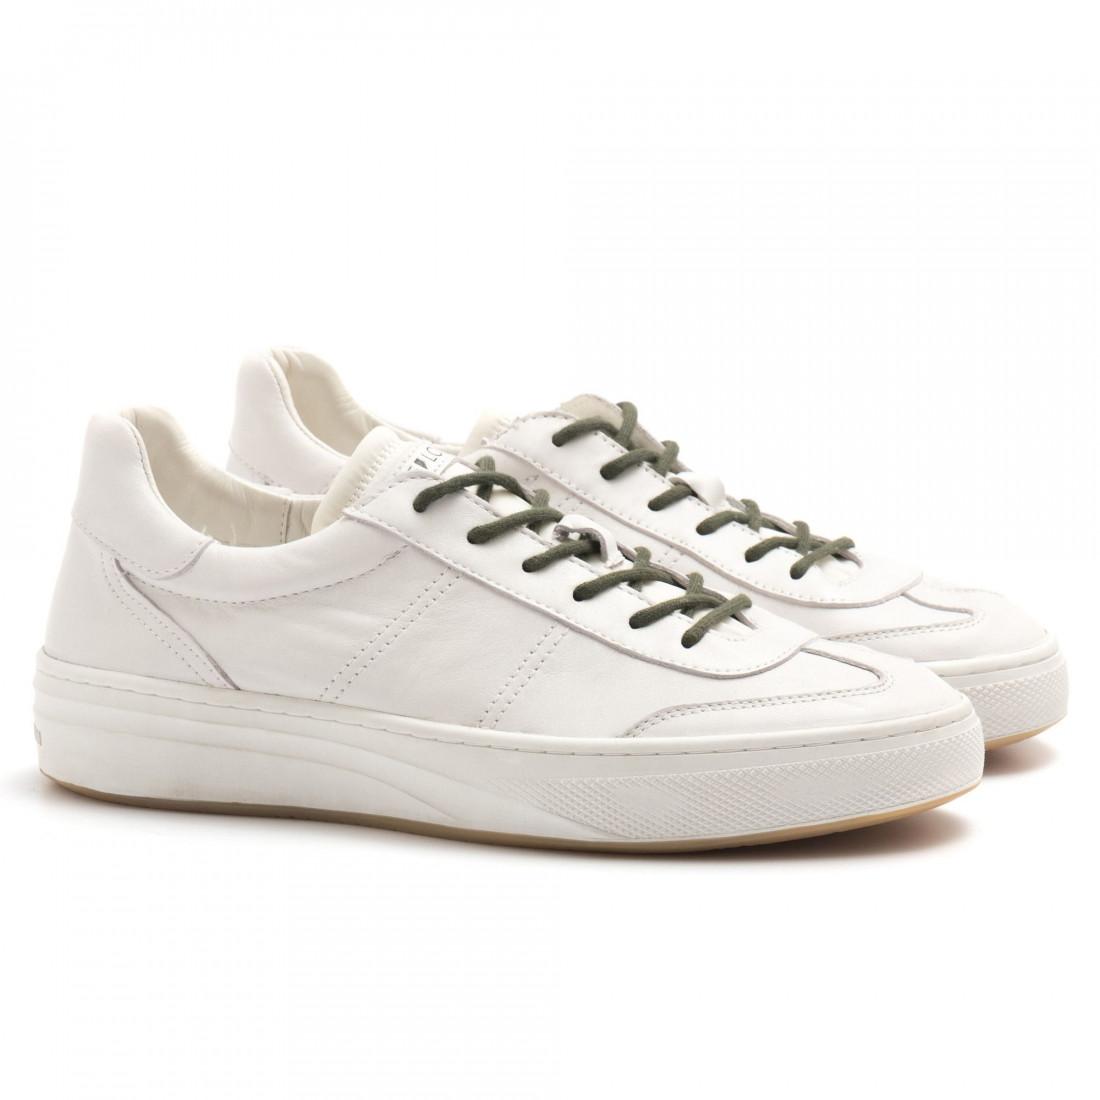 sneakers uomo crime london 1136110 4358